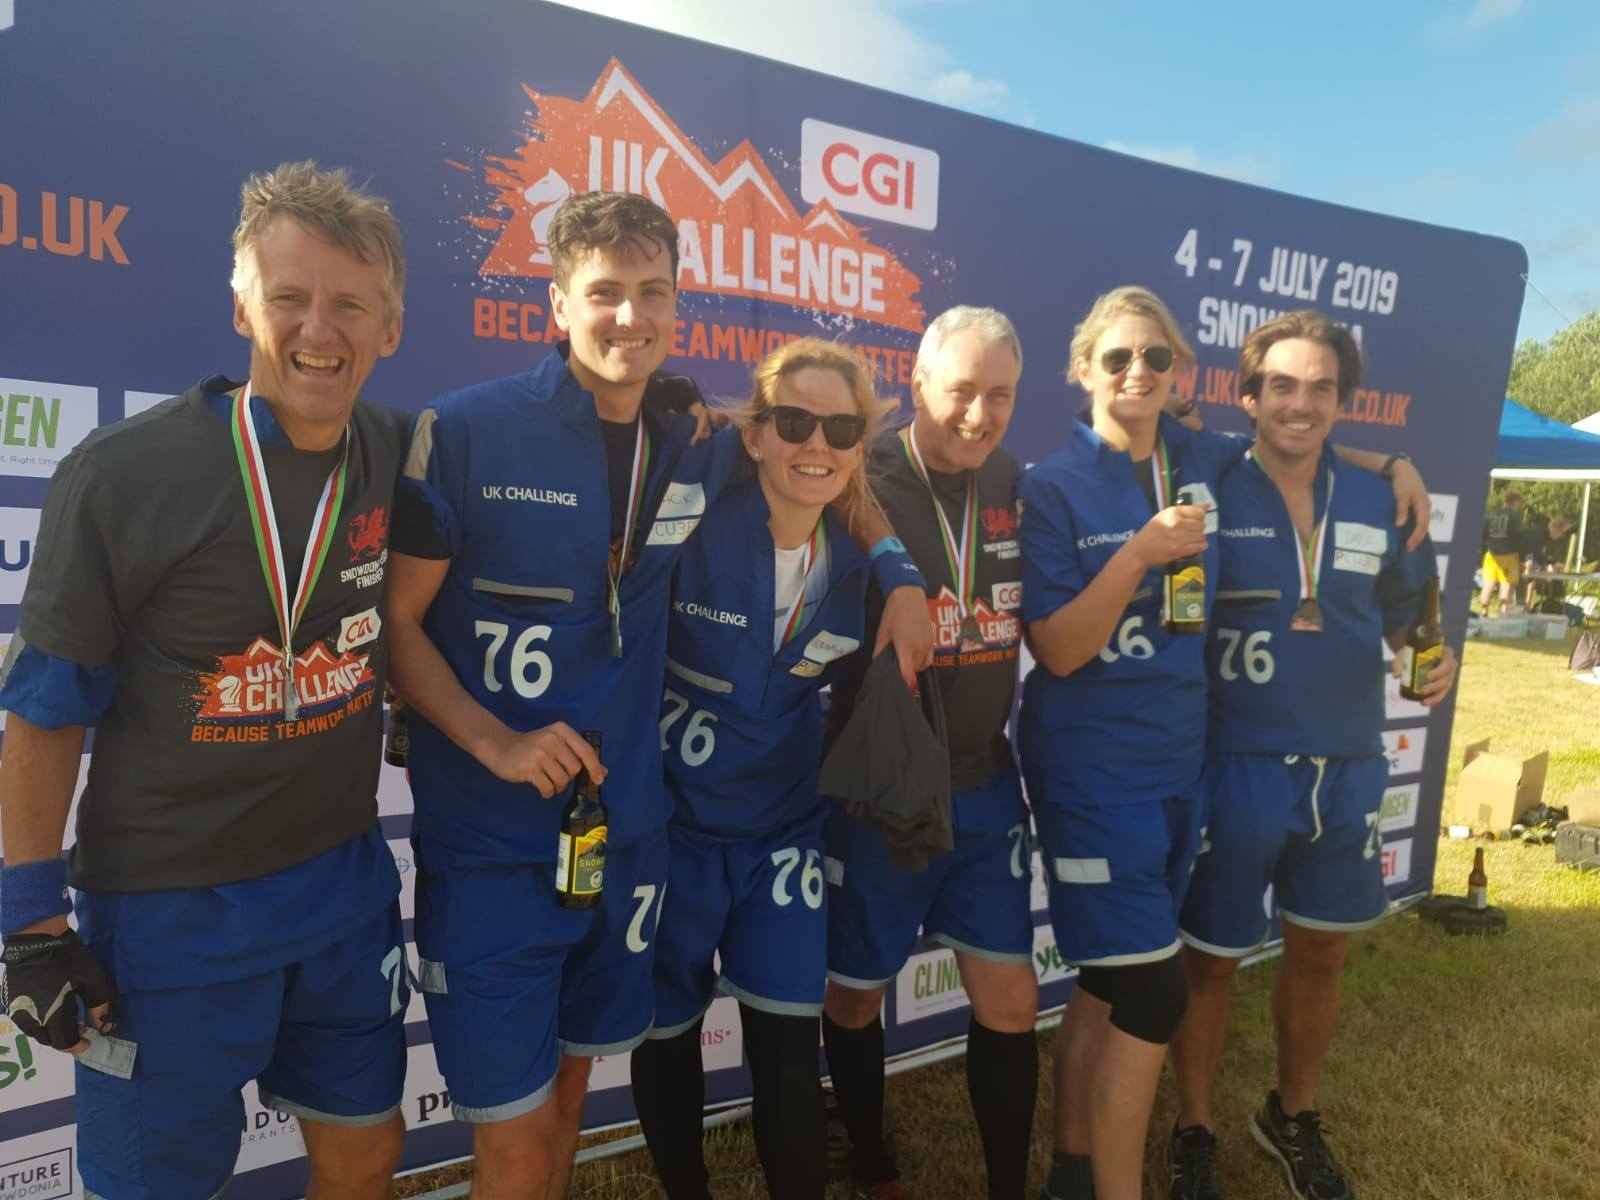 UK Challenge Team 2019